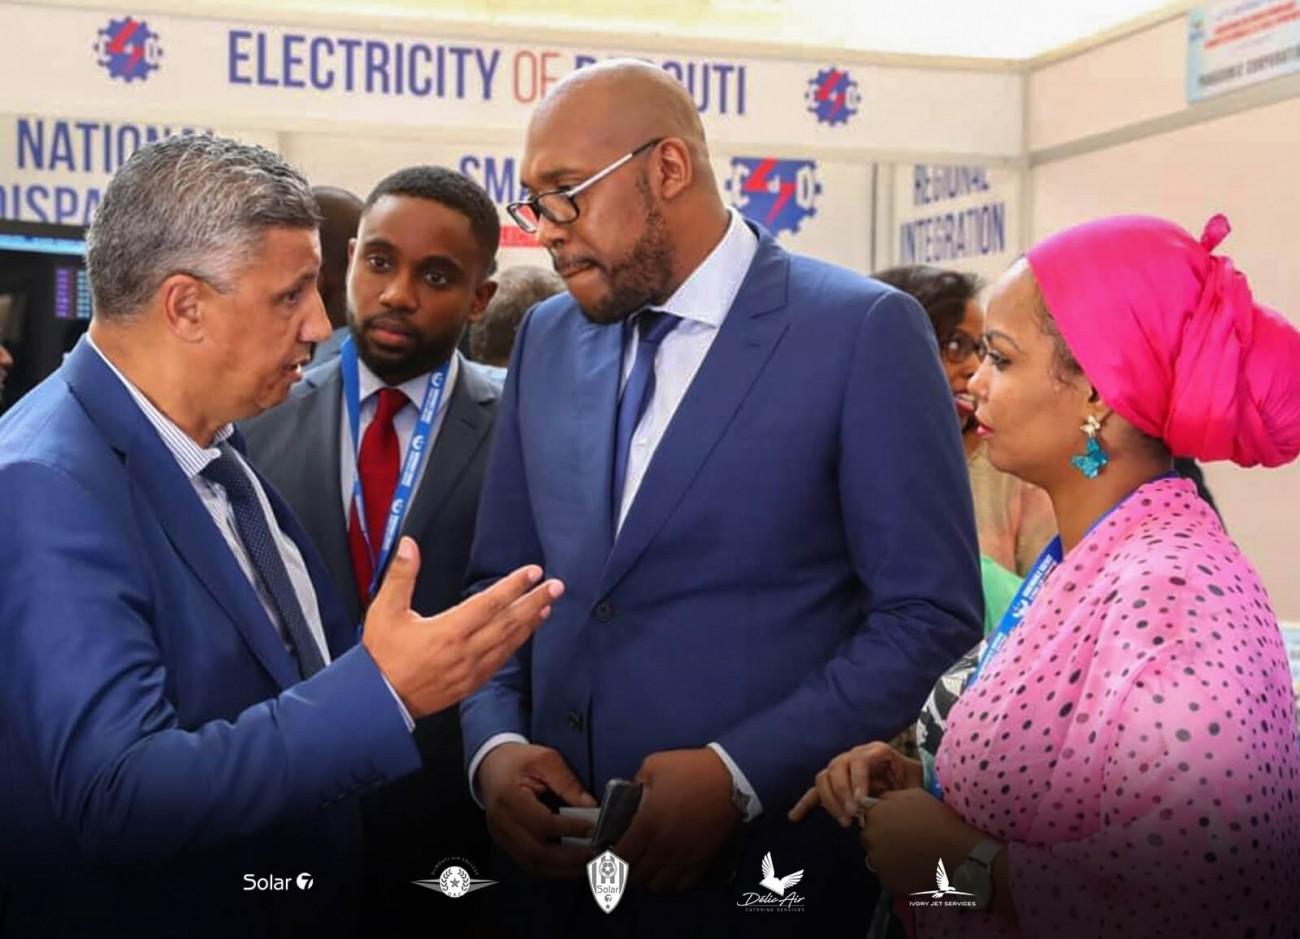 Djibouti Tommy Tayoro Nyckoss lors des foires d'énergie